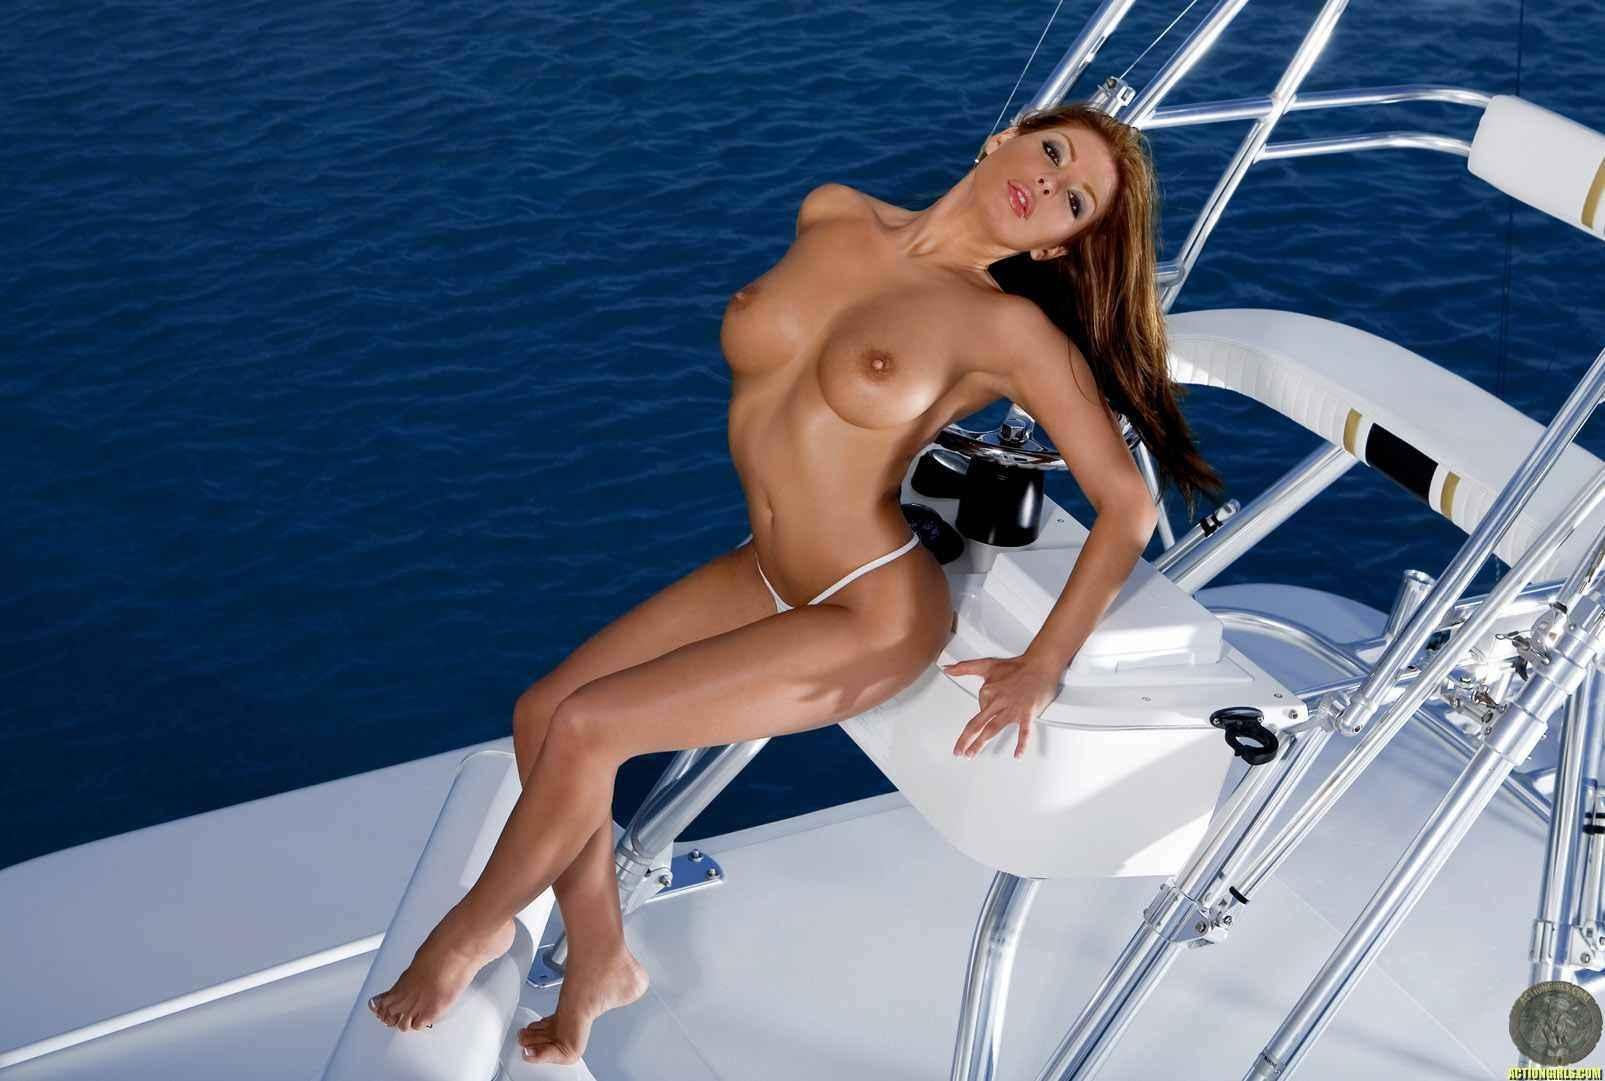 Private bucks party cruise sydney